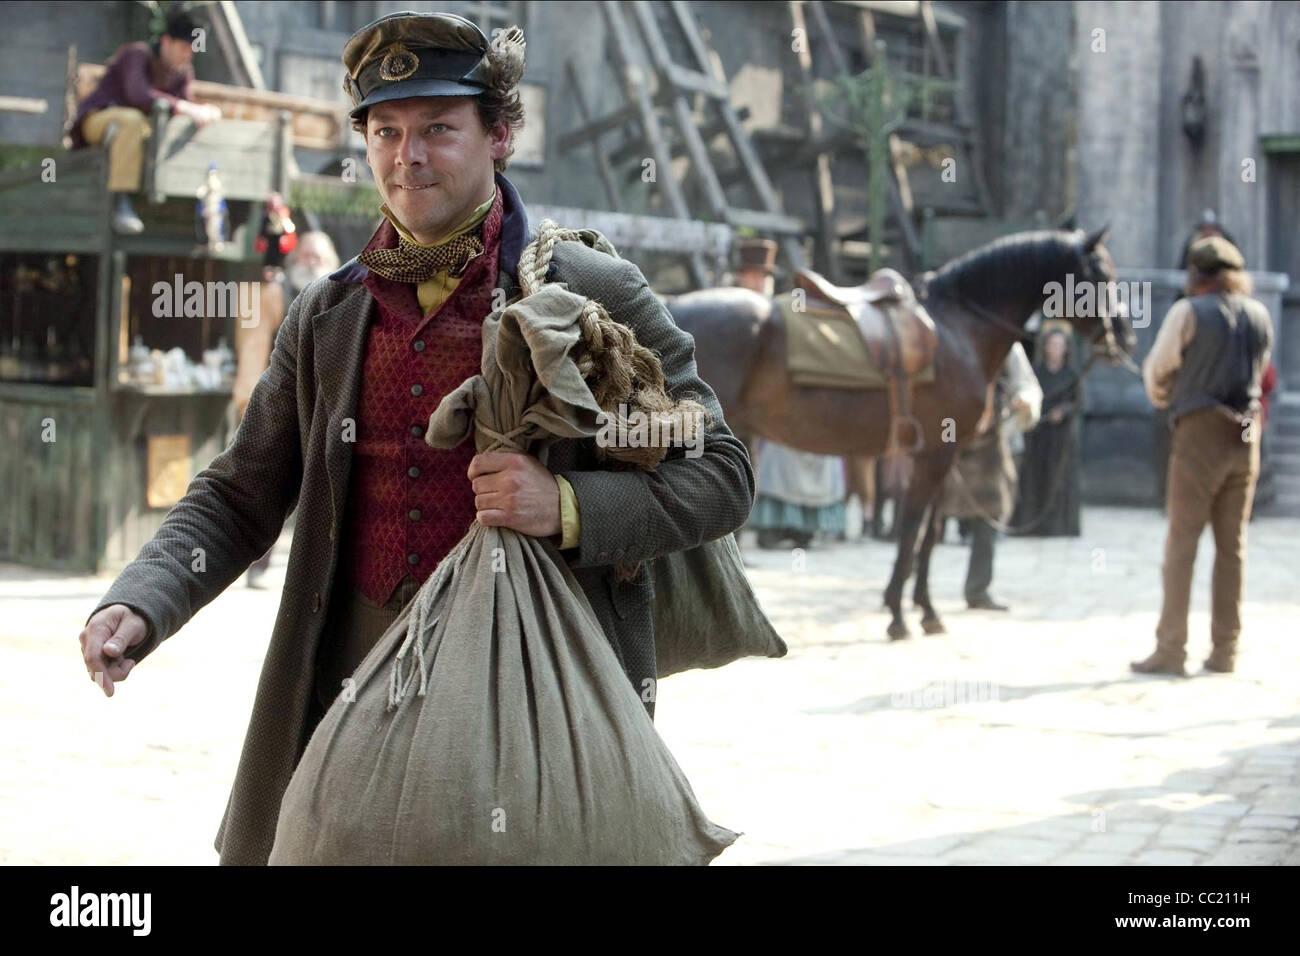 RICHARD COYLE GOING POSTAL (2010) - Stock Image